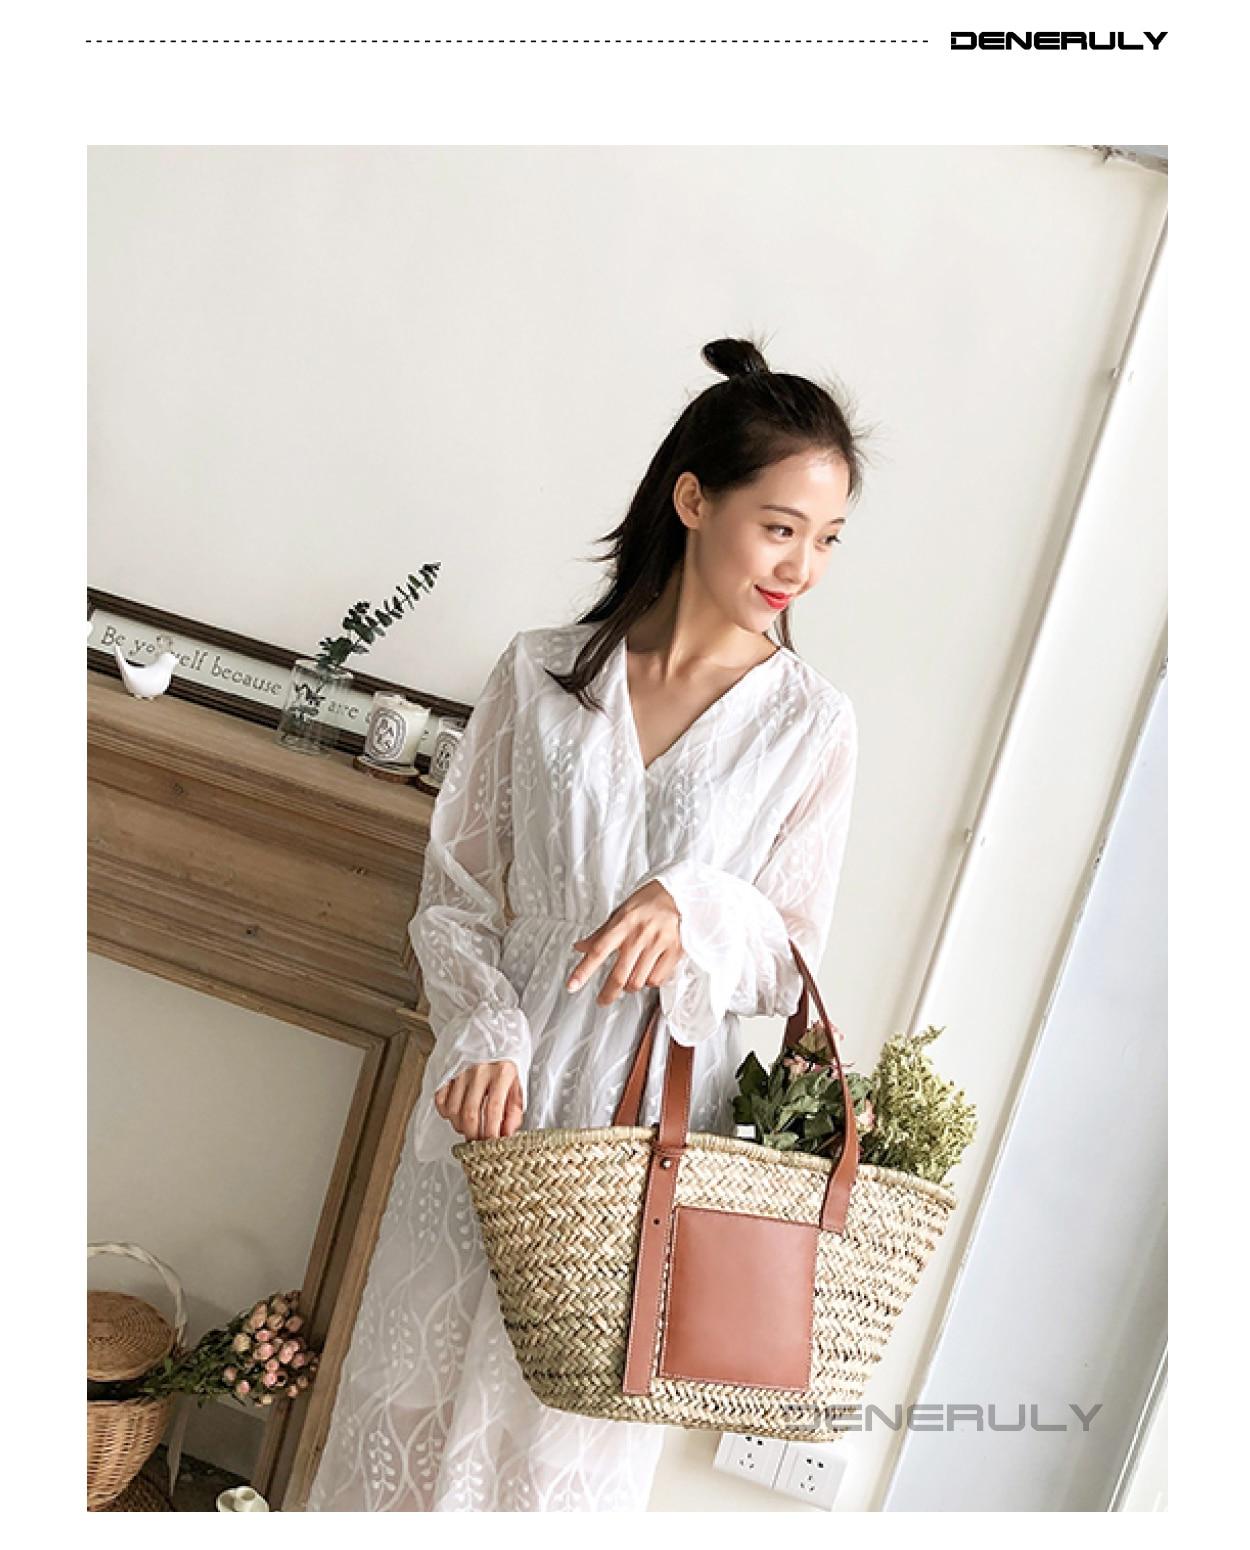 Image 5 - Beach Rattan Bag Women New Elegant Straw Bag Bolsos Mujer De Marca Famosa 2019 Bolso Paja Bolso Playa Designe Luxury Handbags-in Shoulder Bags from Luggage & Bags